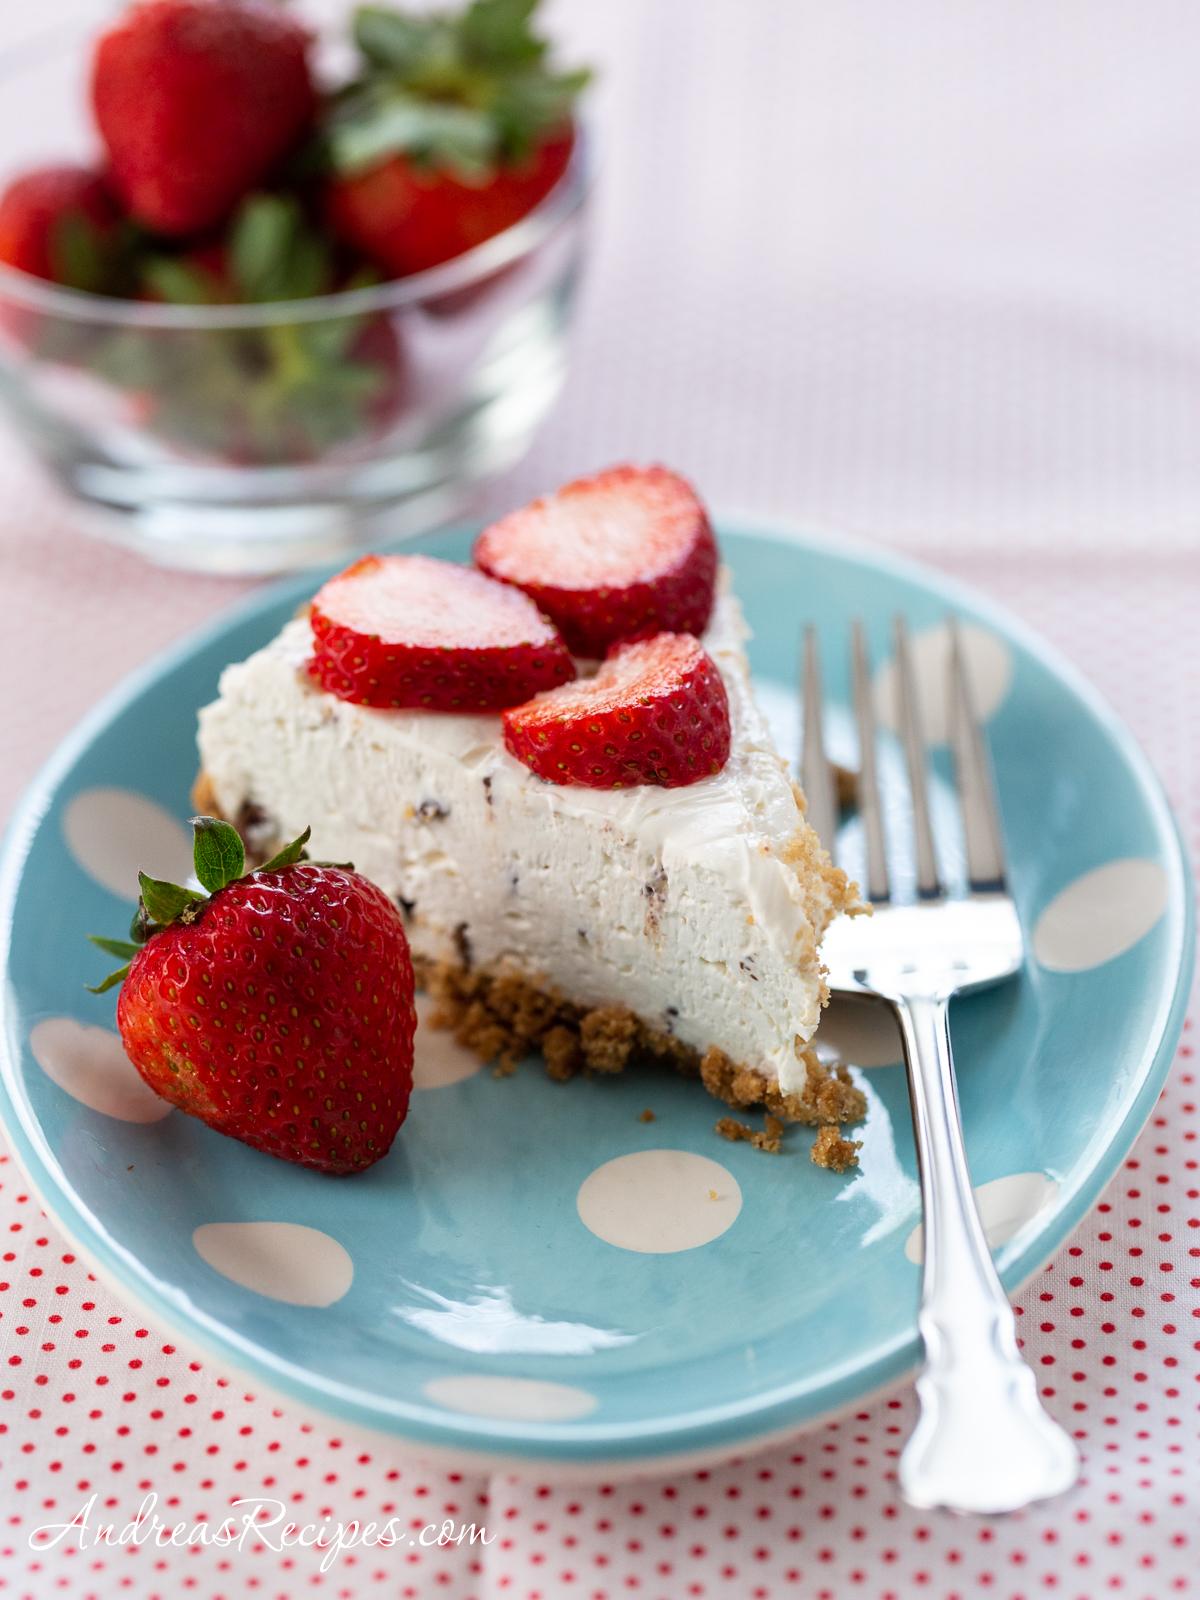 No-bake Cheesecake - Andrea Meyers